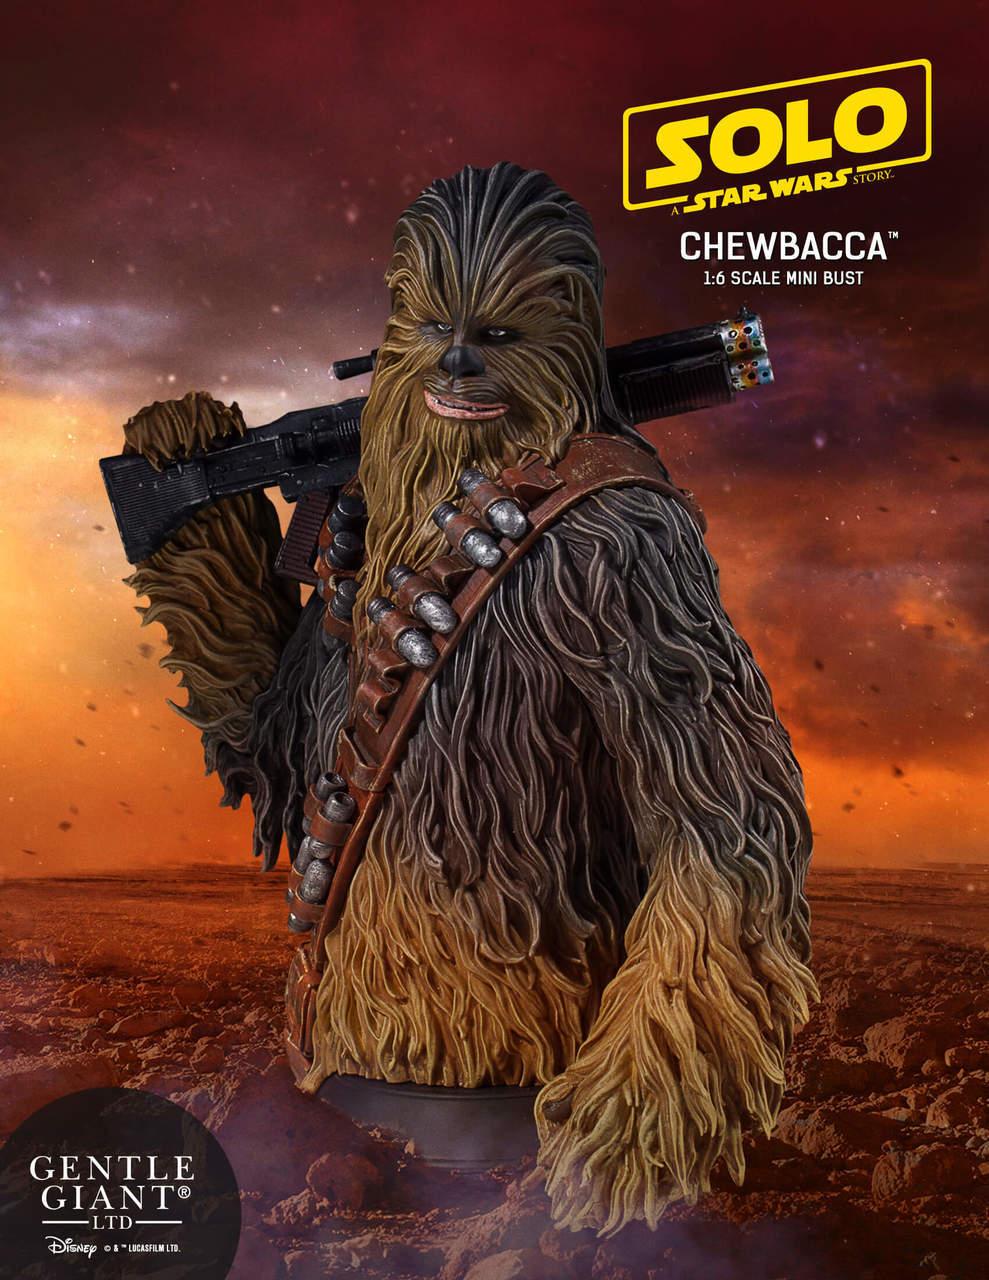 3a0d3cfa2dbd Gentle Giant Ltd • Collection • Star Wars Universe